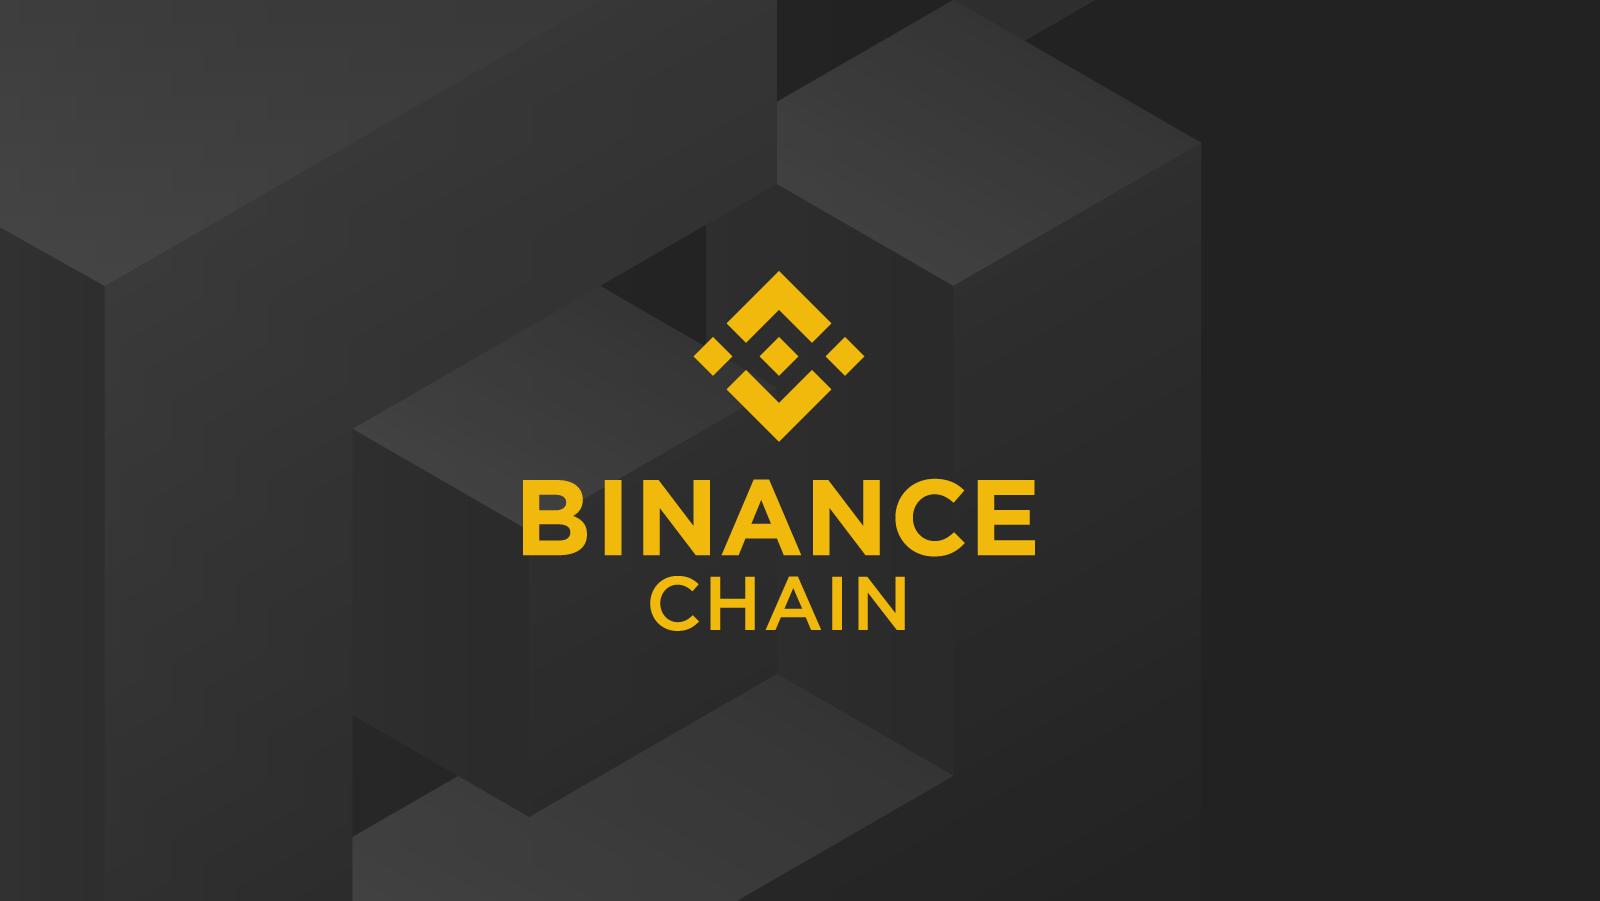 SEC проявила интерес к транзакциям Binance Chain